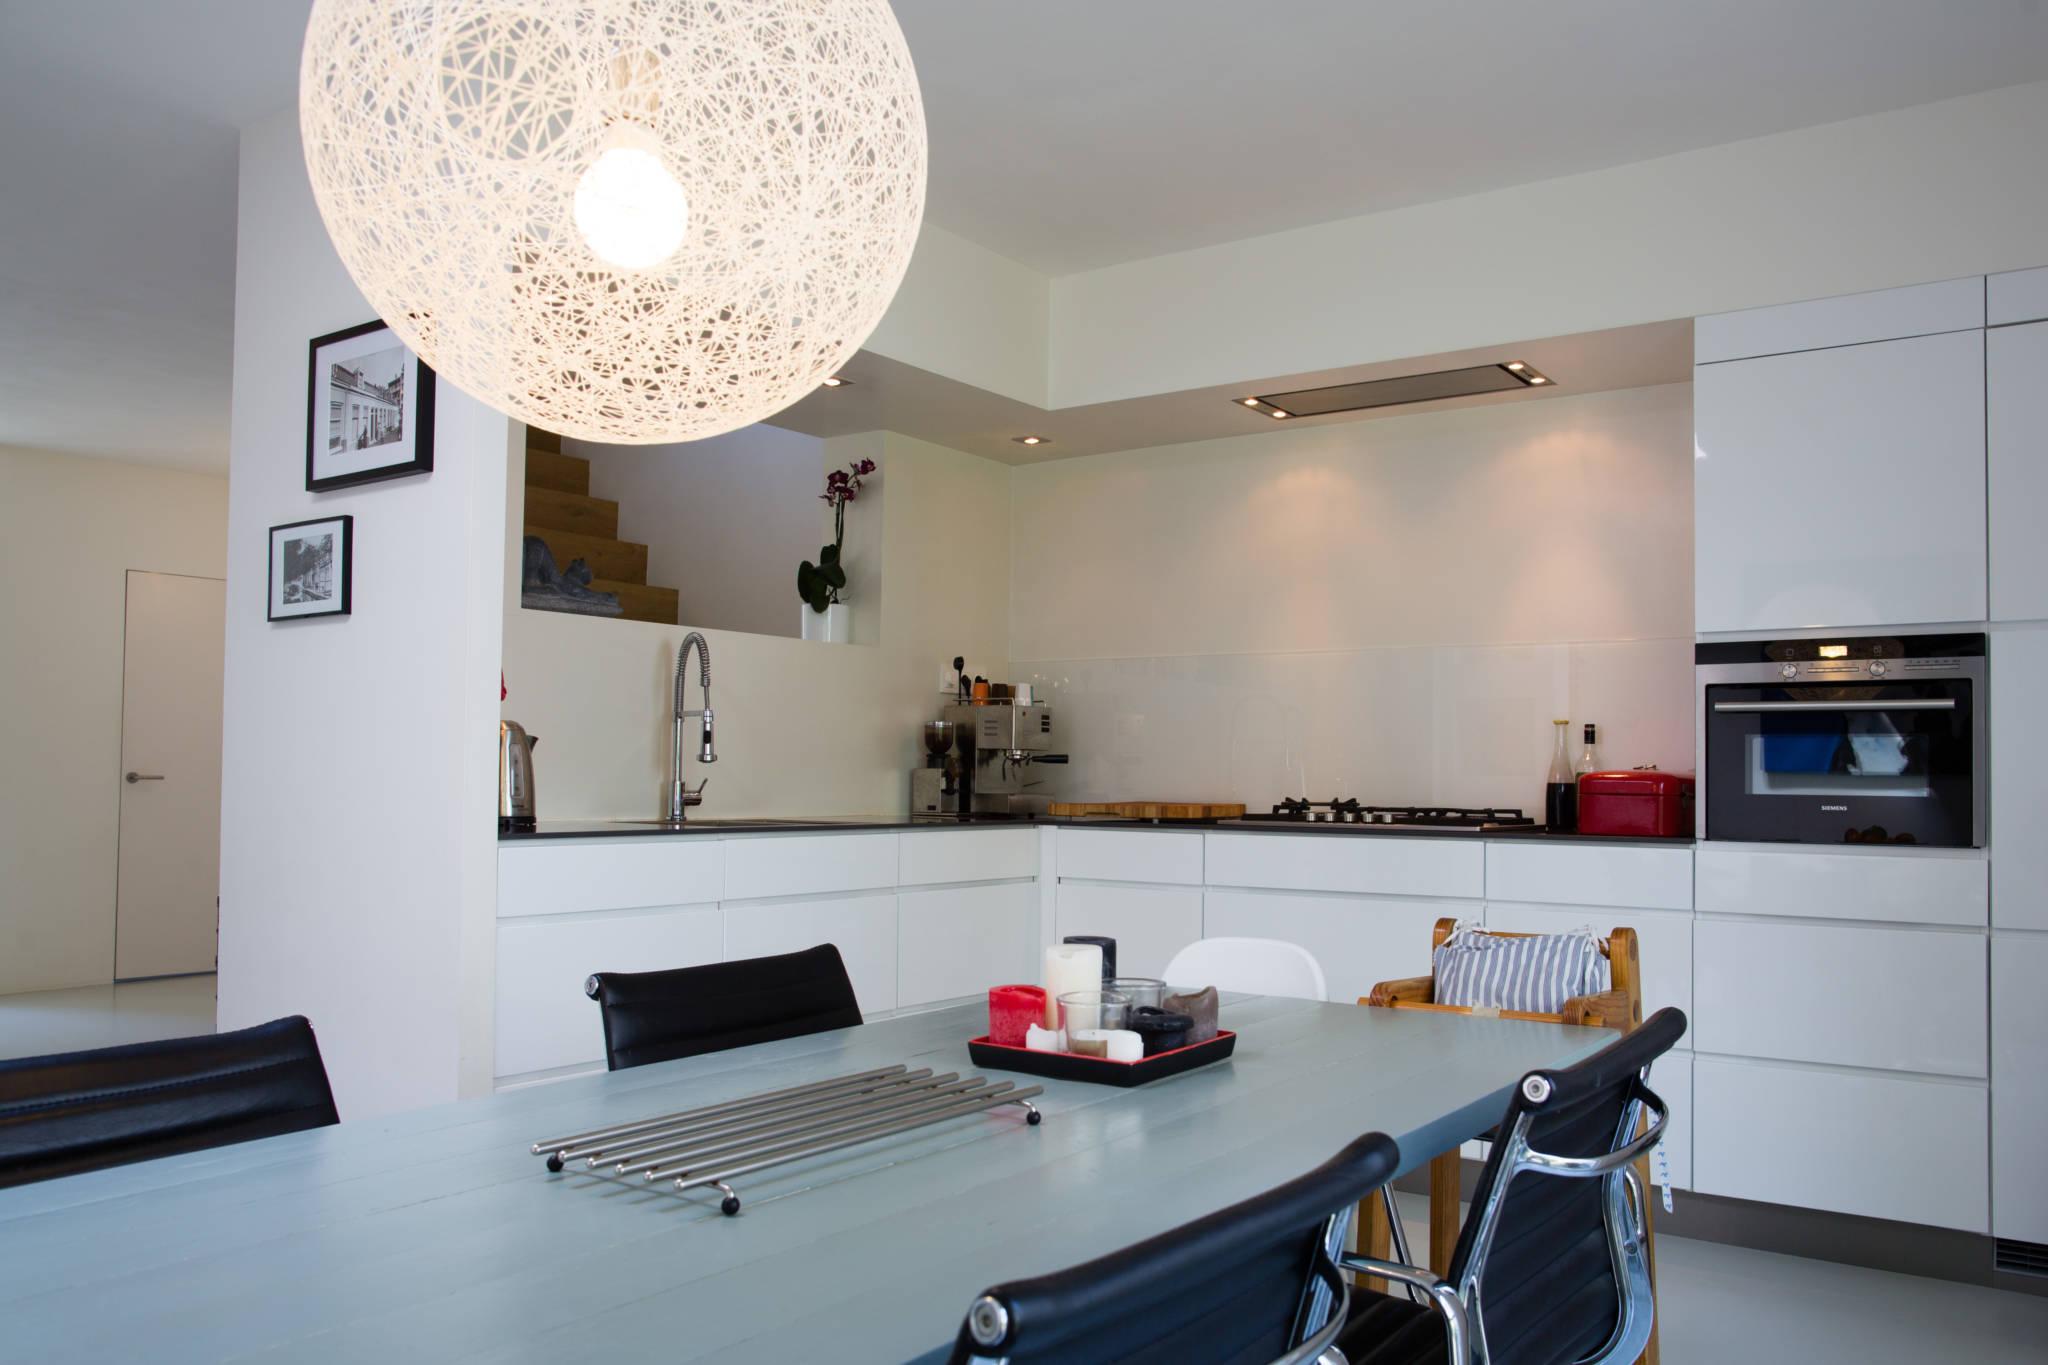 Keuken Onder Trap : Keuken planner fresh keuken onder de trap kitchen foto s